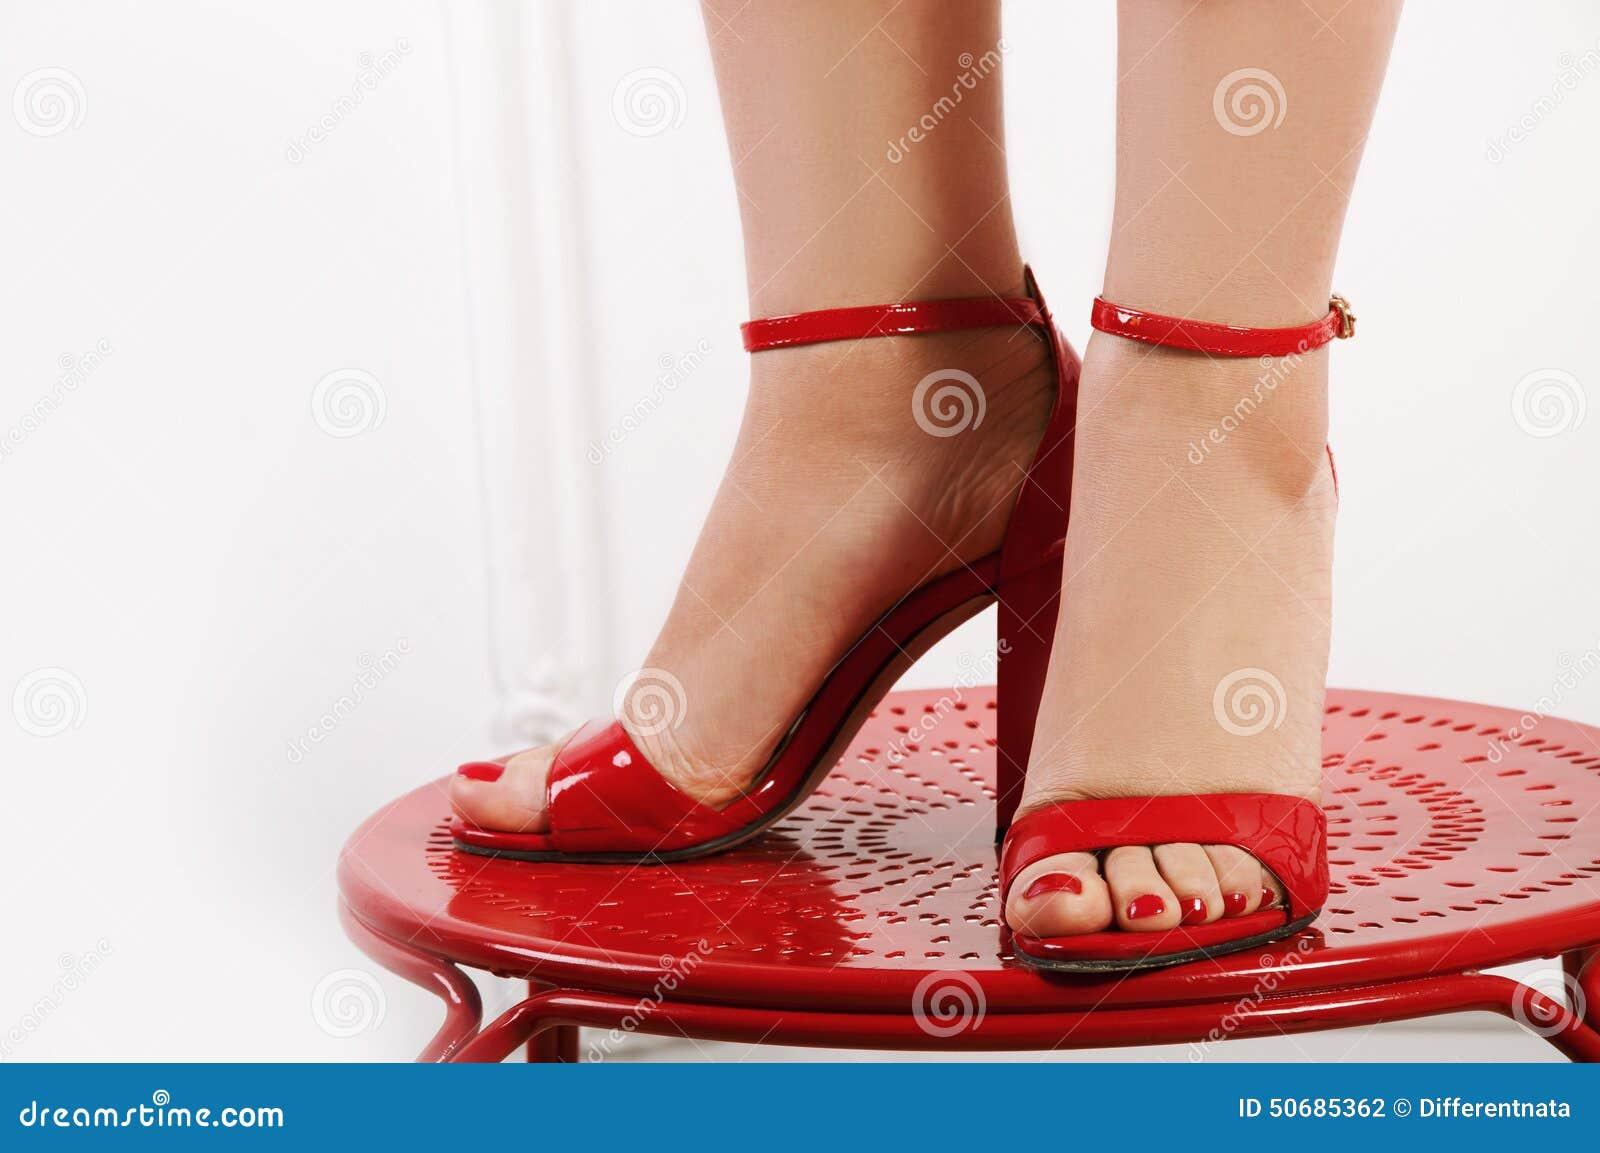 Download 在红色窥视脚趾的妇女的赤脚 库存照片. 图片 包括有 短剑, 方式, 皮革, 背包, 鞋类, 典雅, 凉鞋 - 50685362